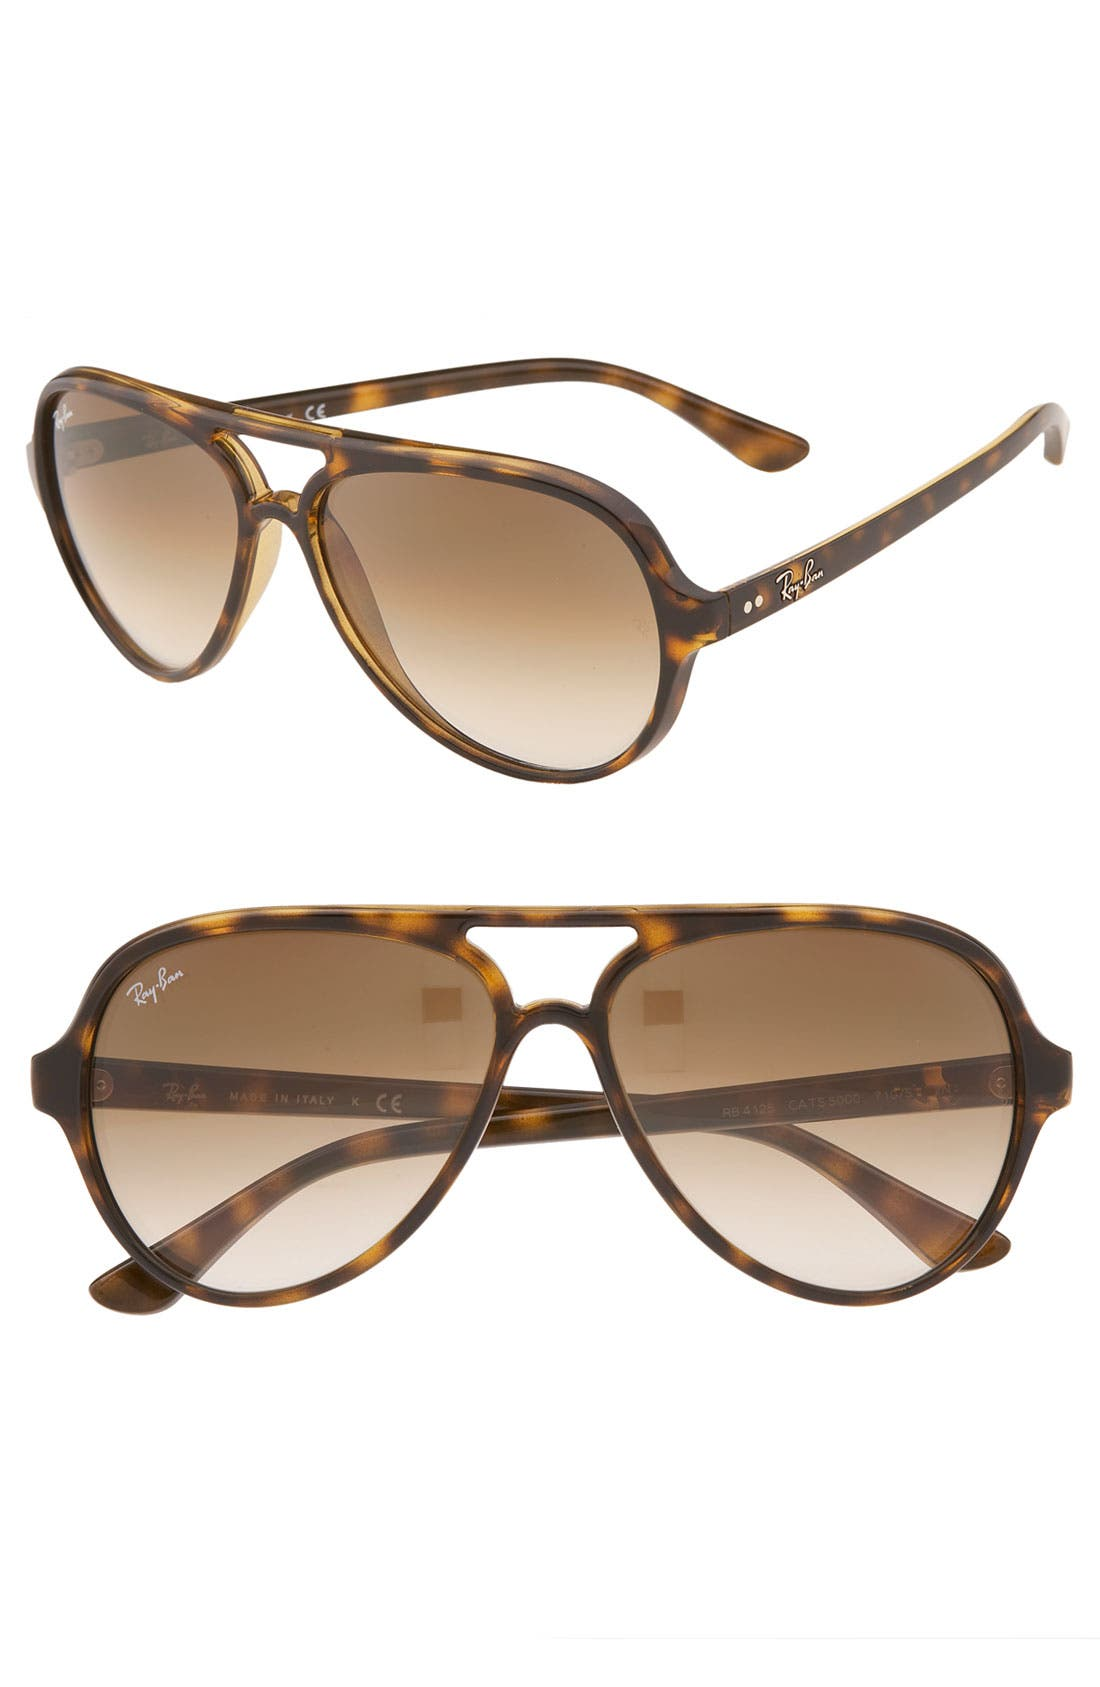 59mm Resin Aviator Sunglasses,                         Main,                         color, Light Havana